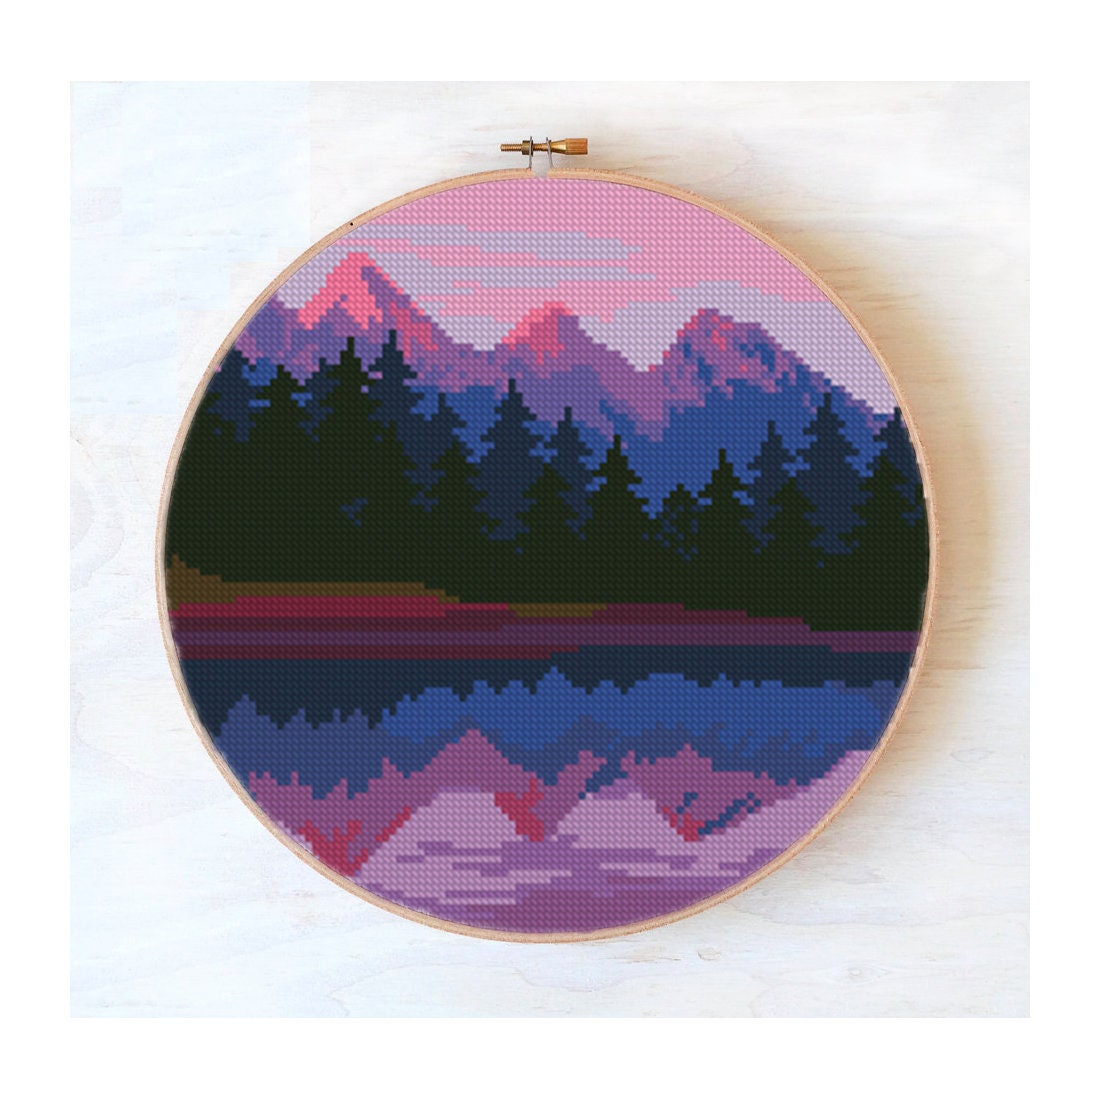 Cross stitch landscape mountains, pink sunset,modern cross stitch lake, nature cross stitch pattern, embroidery hoop art #339